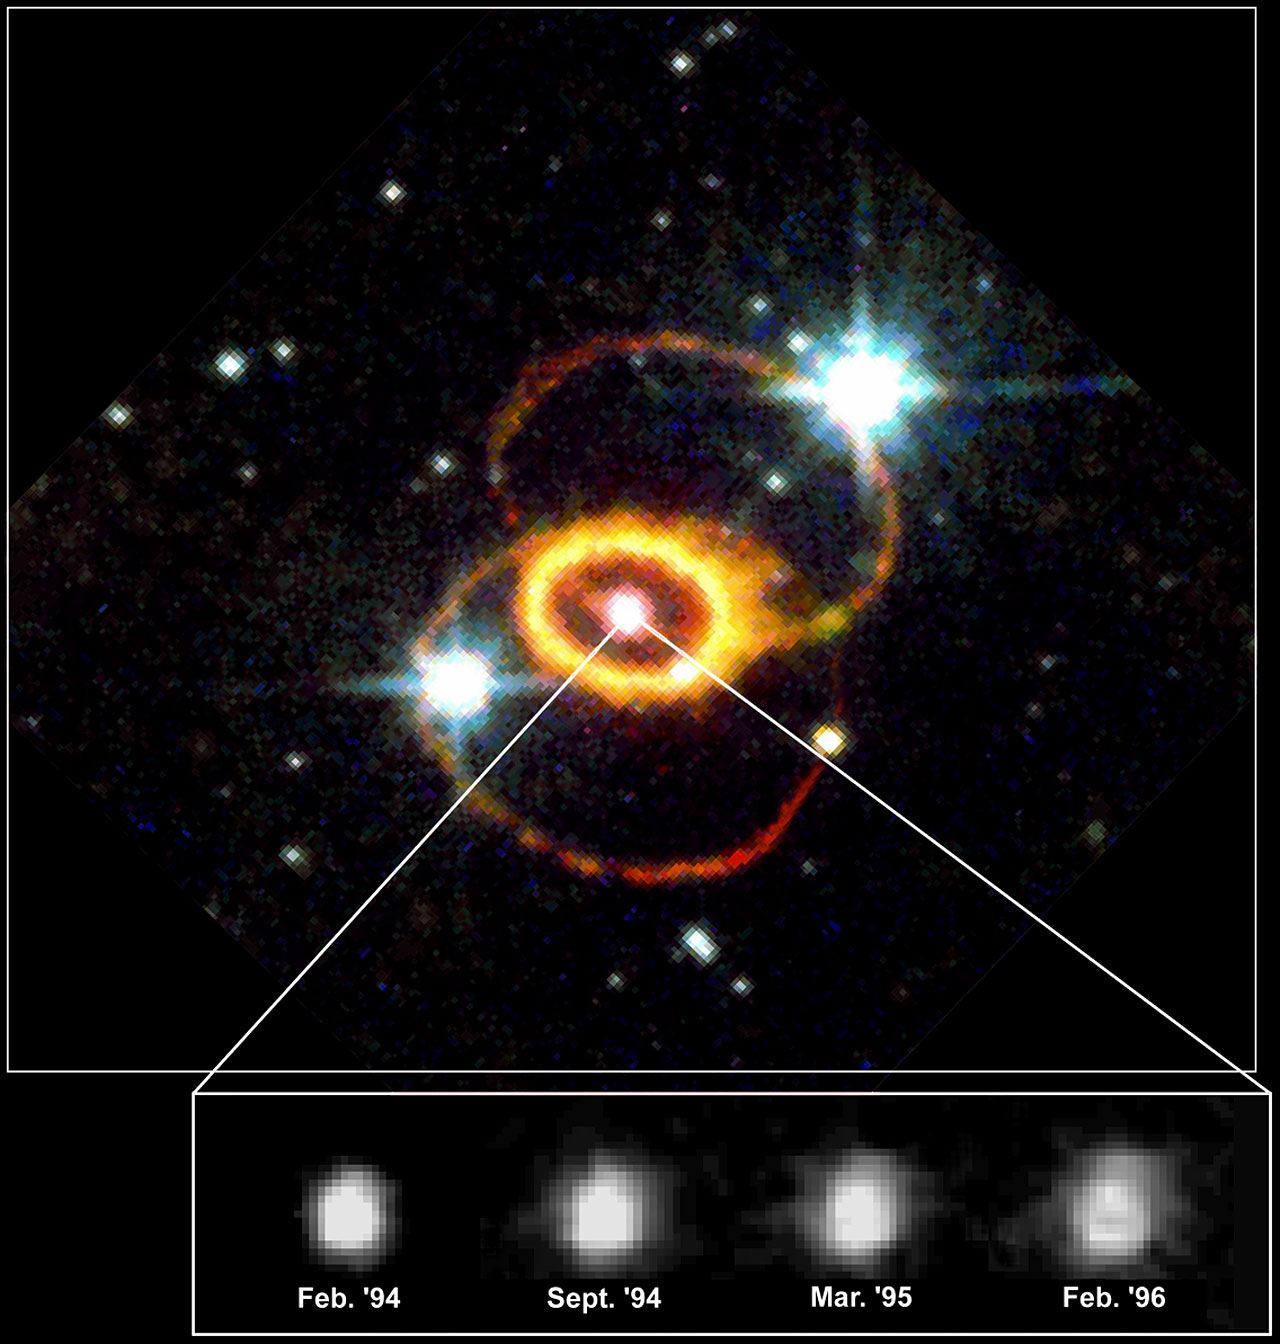 exploding supernova hubble telescope - photo #12